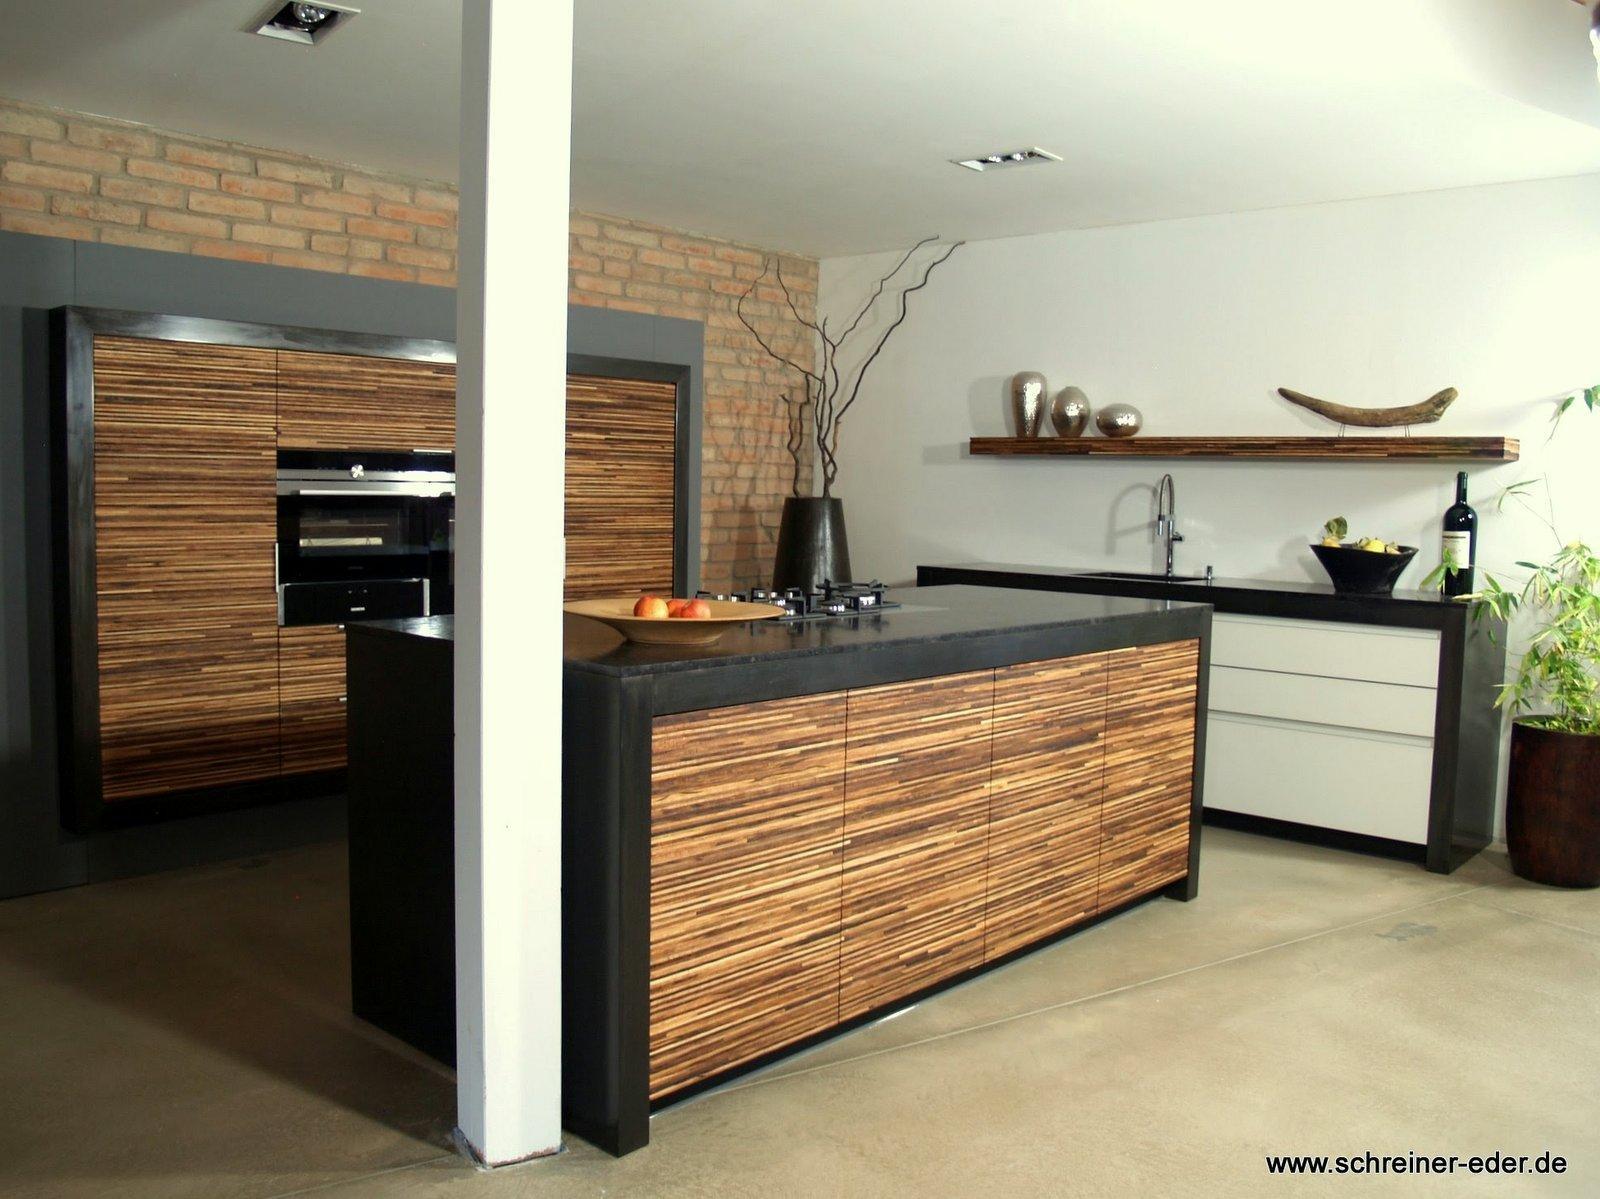 Full Size of Holzküche Modern Holzküche Tchibo Hape Wanju Holzküche Holzküche Kinderküche Gebraucht Küche Holzküche